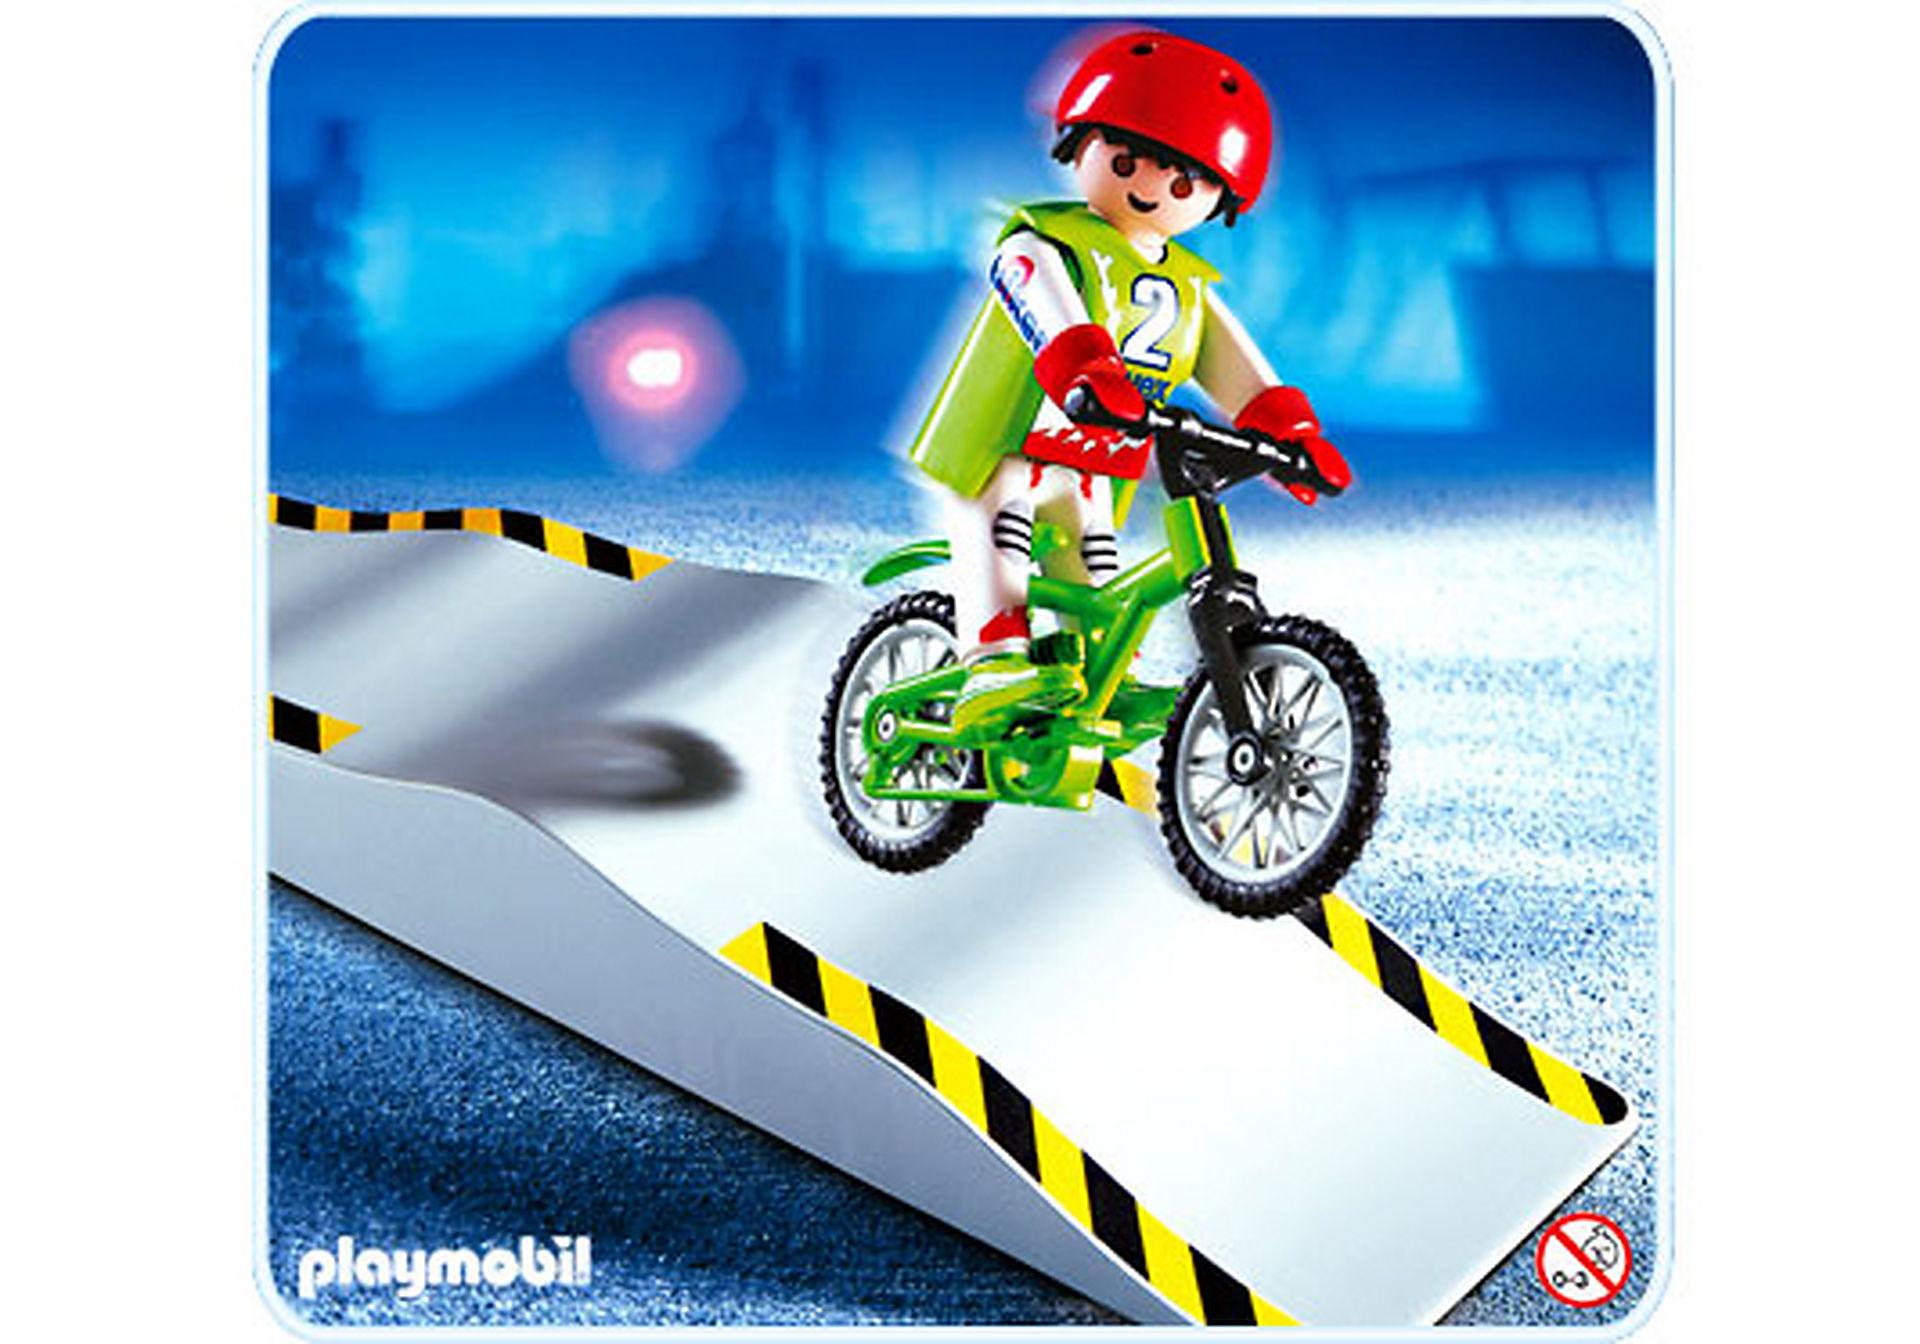 http://media.playmobil.com/i/playmobil/4417-A_product_detail/Pilote de VTT / rampe